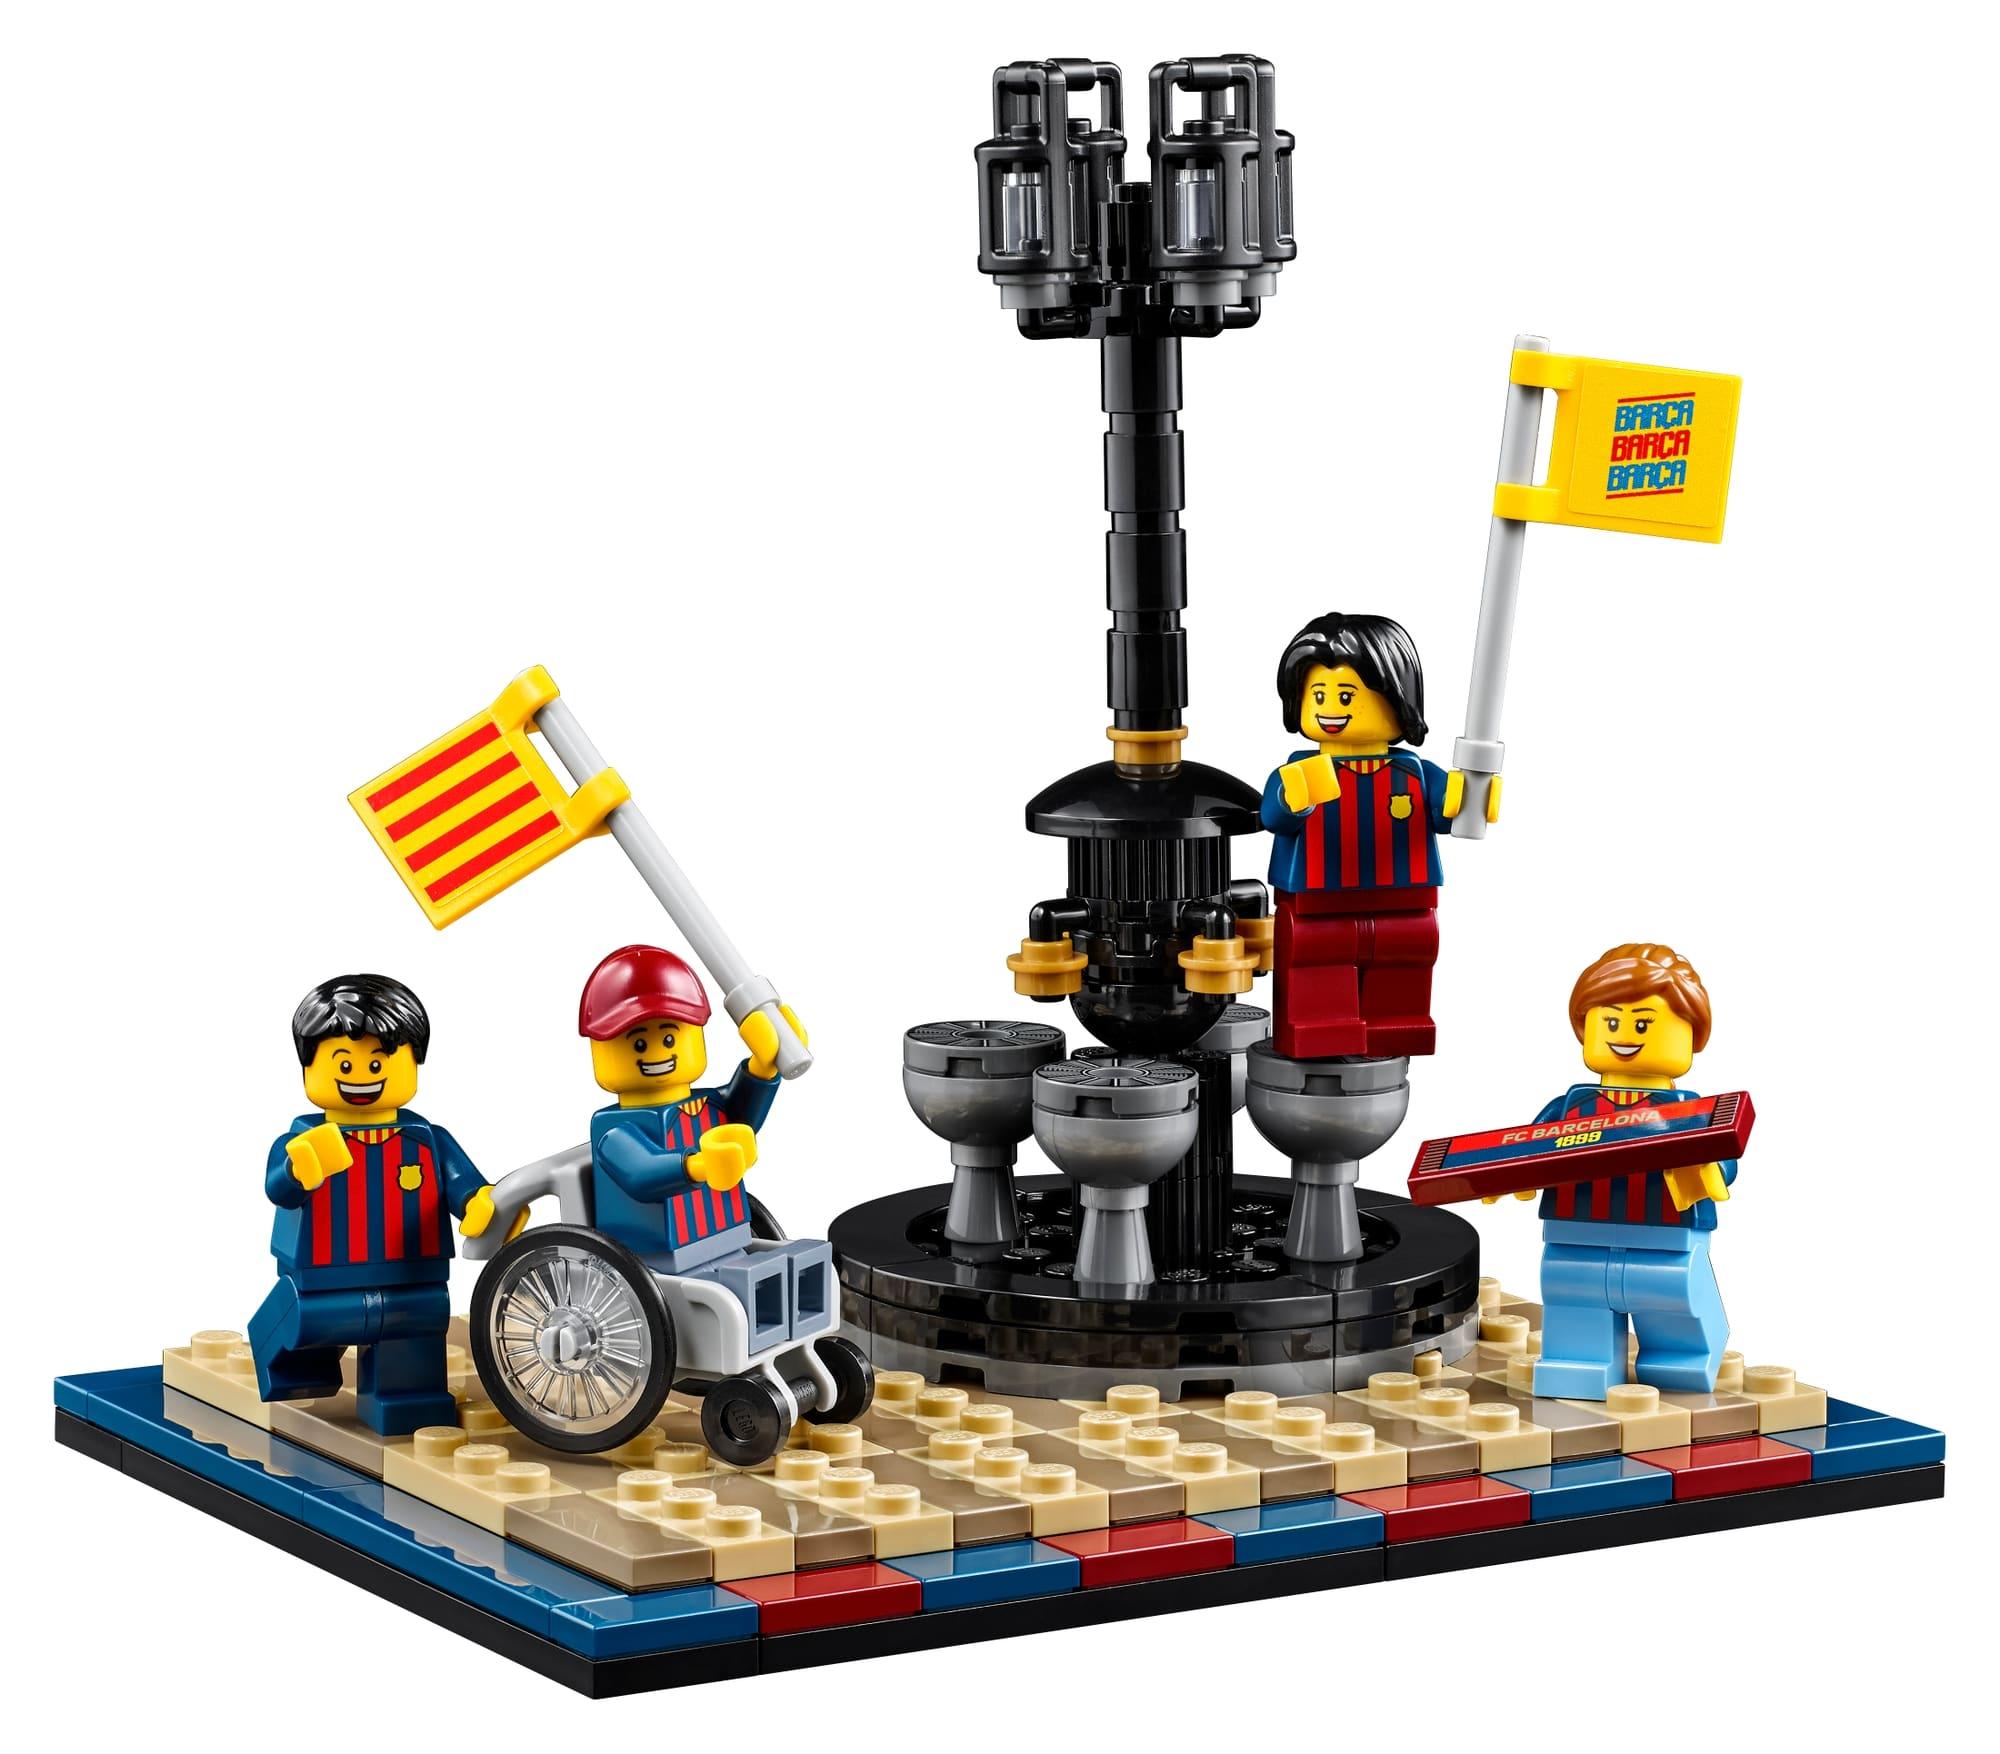 LEGO 40485 Fc Barcelona Celebration 1